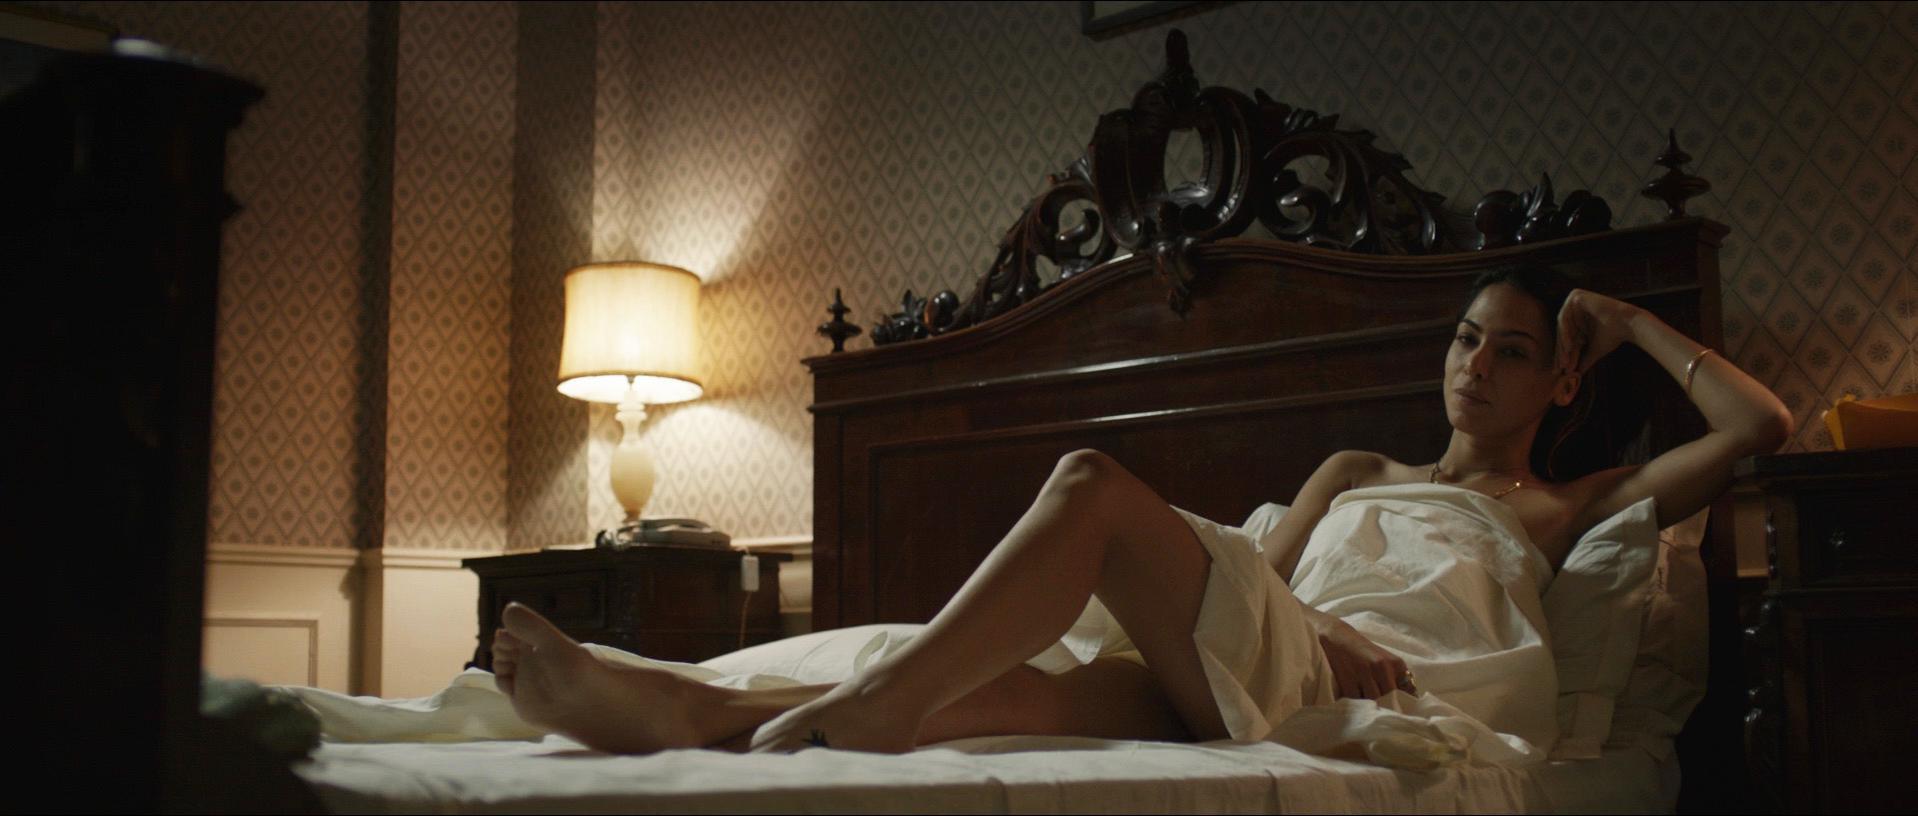 Moran Atias sexy - Third Person (2013)